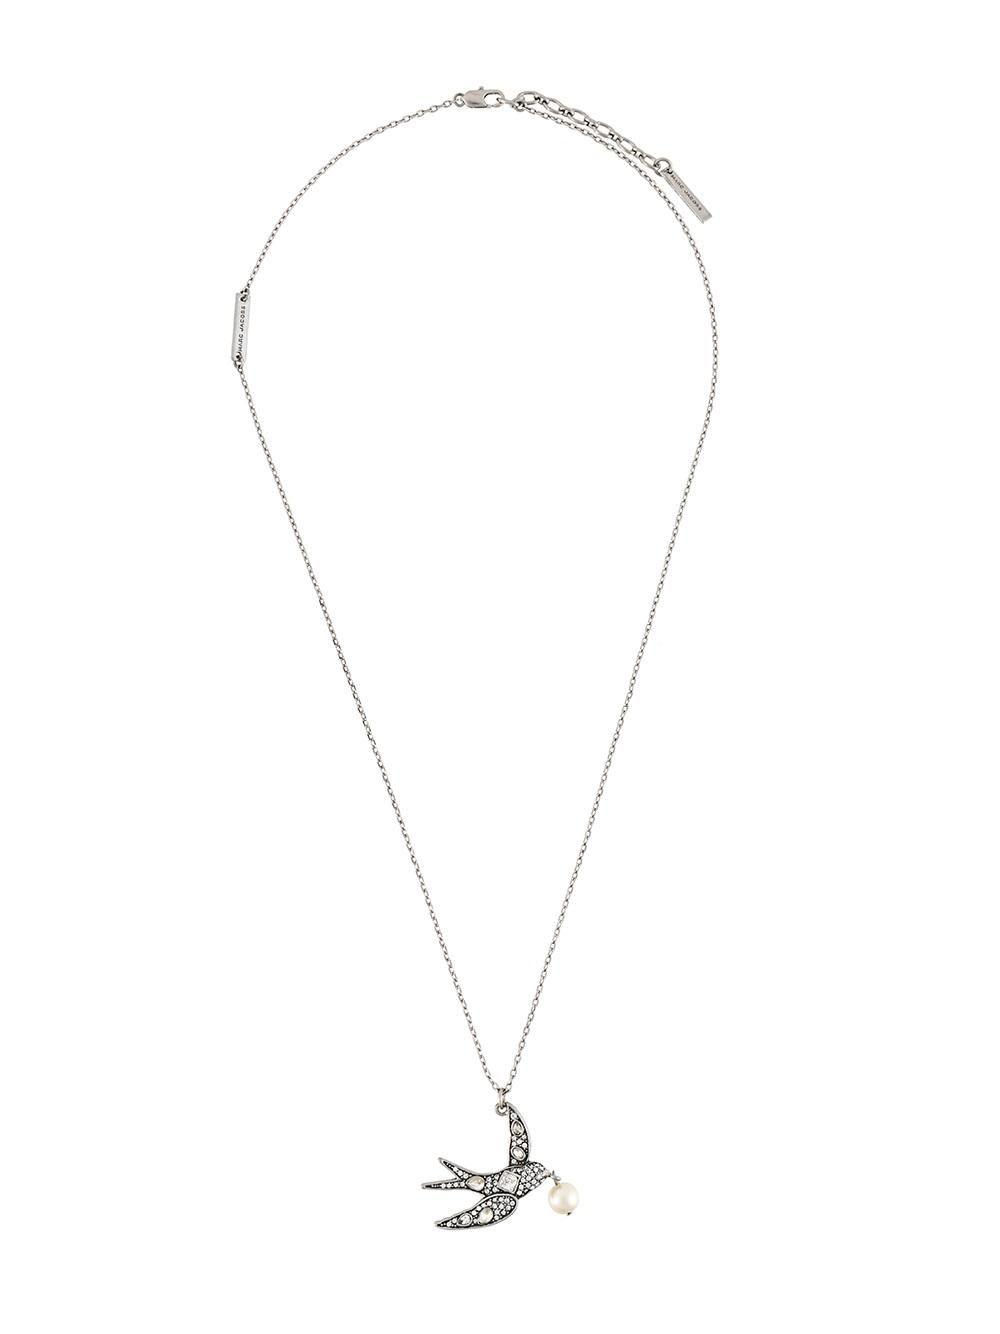 #marcjacobs #swallow #necklace www.jofre.eu